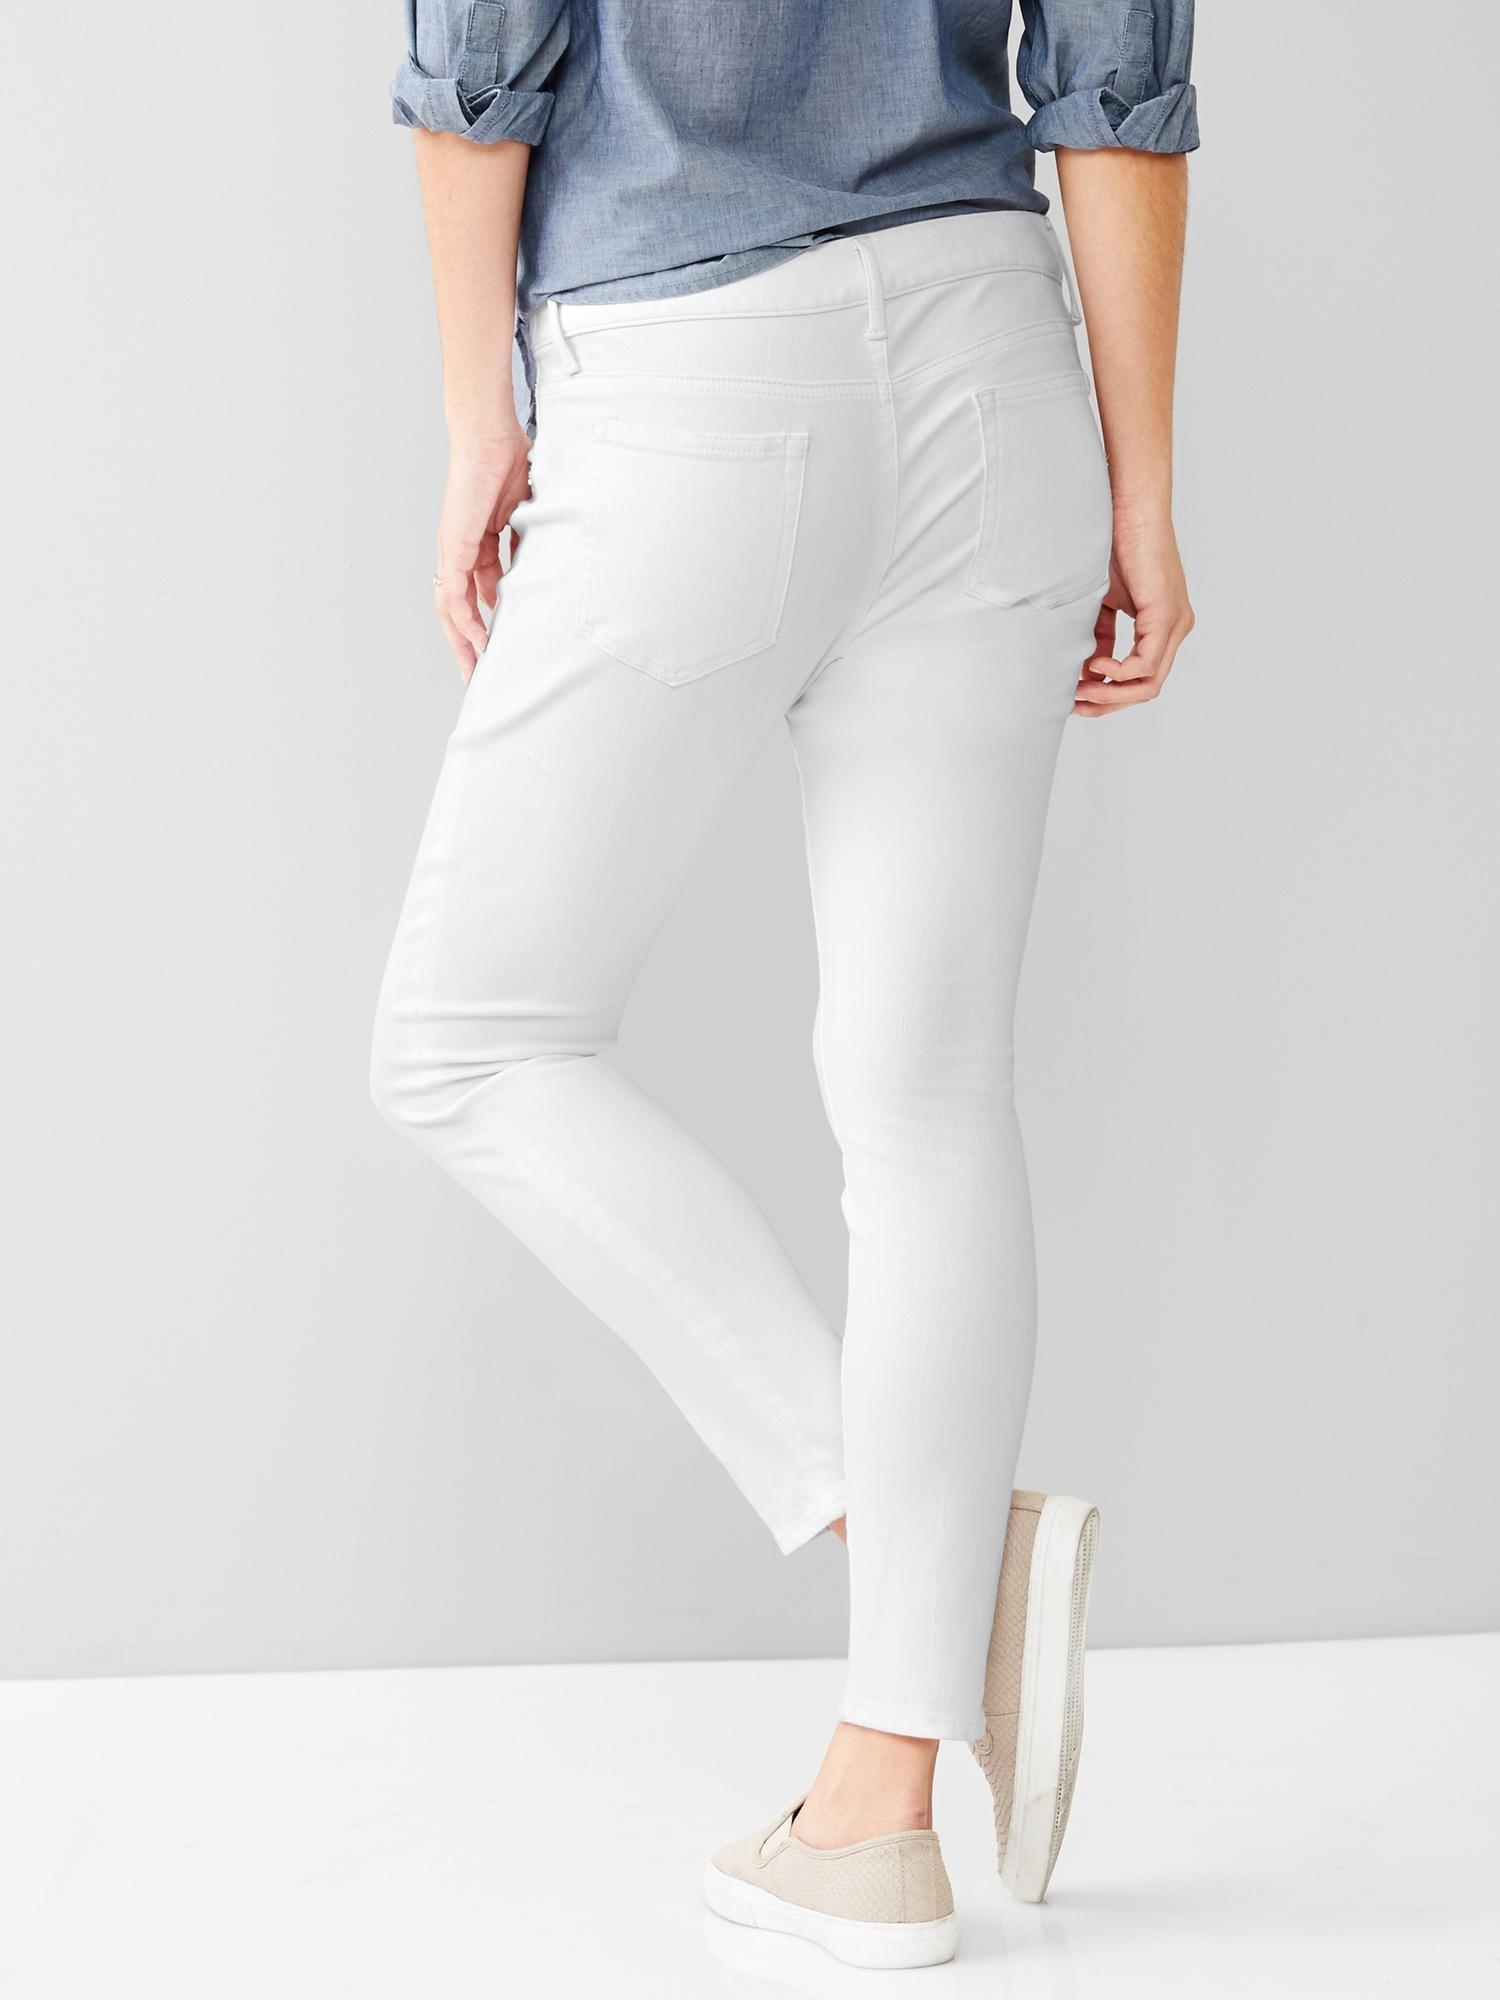 gap 1969 inset panel resolution true skinny skimmer jeans